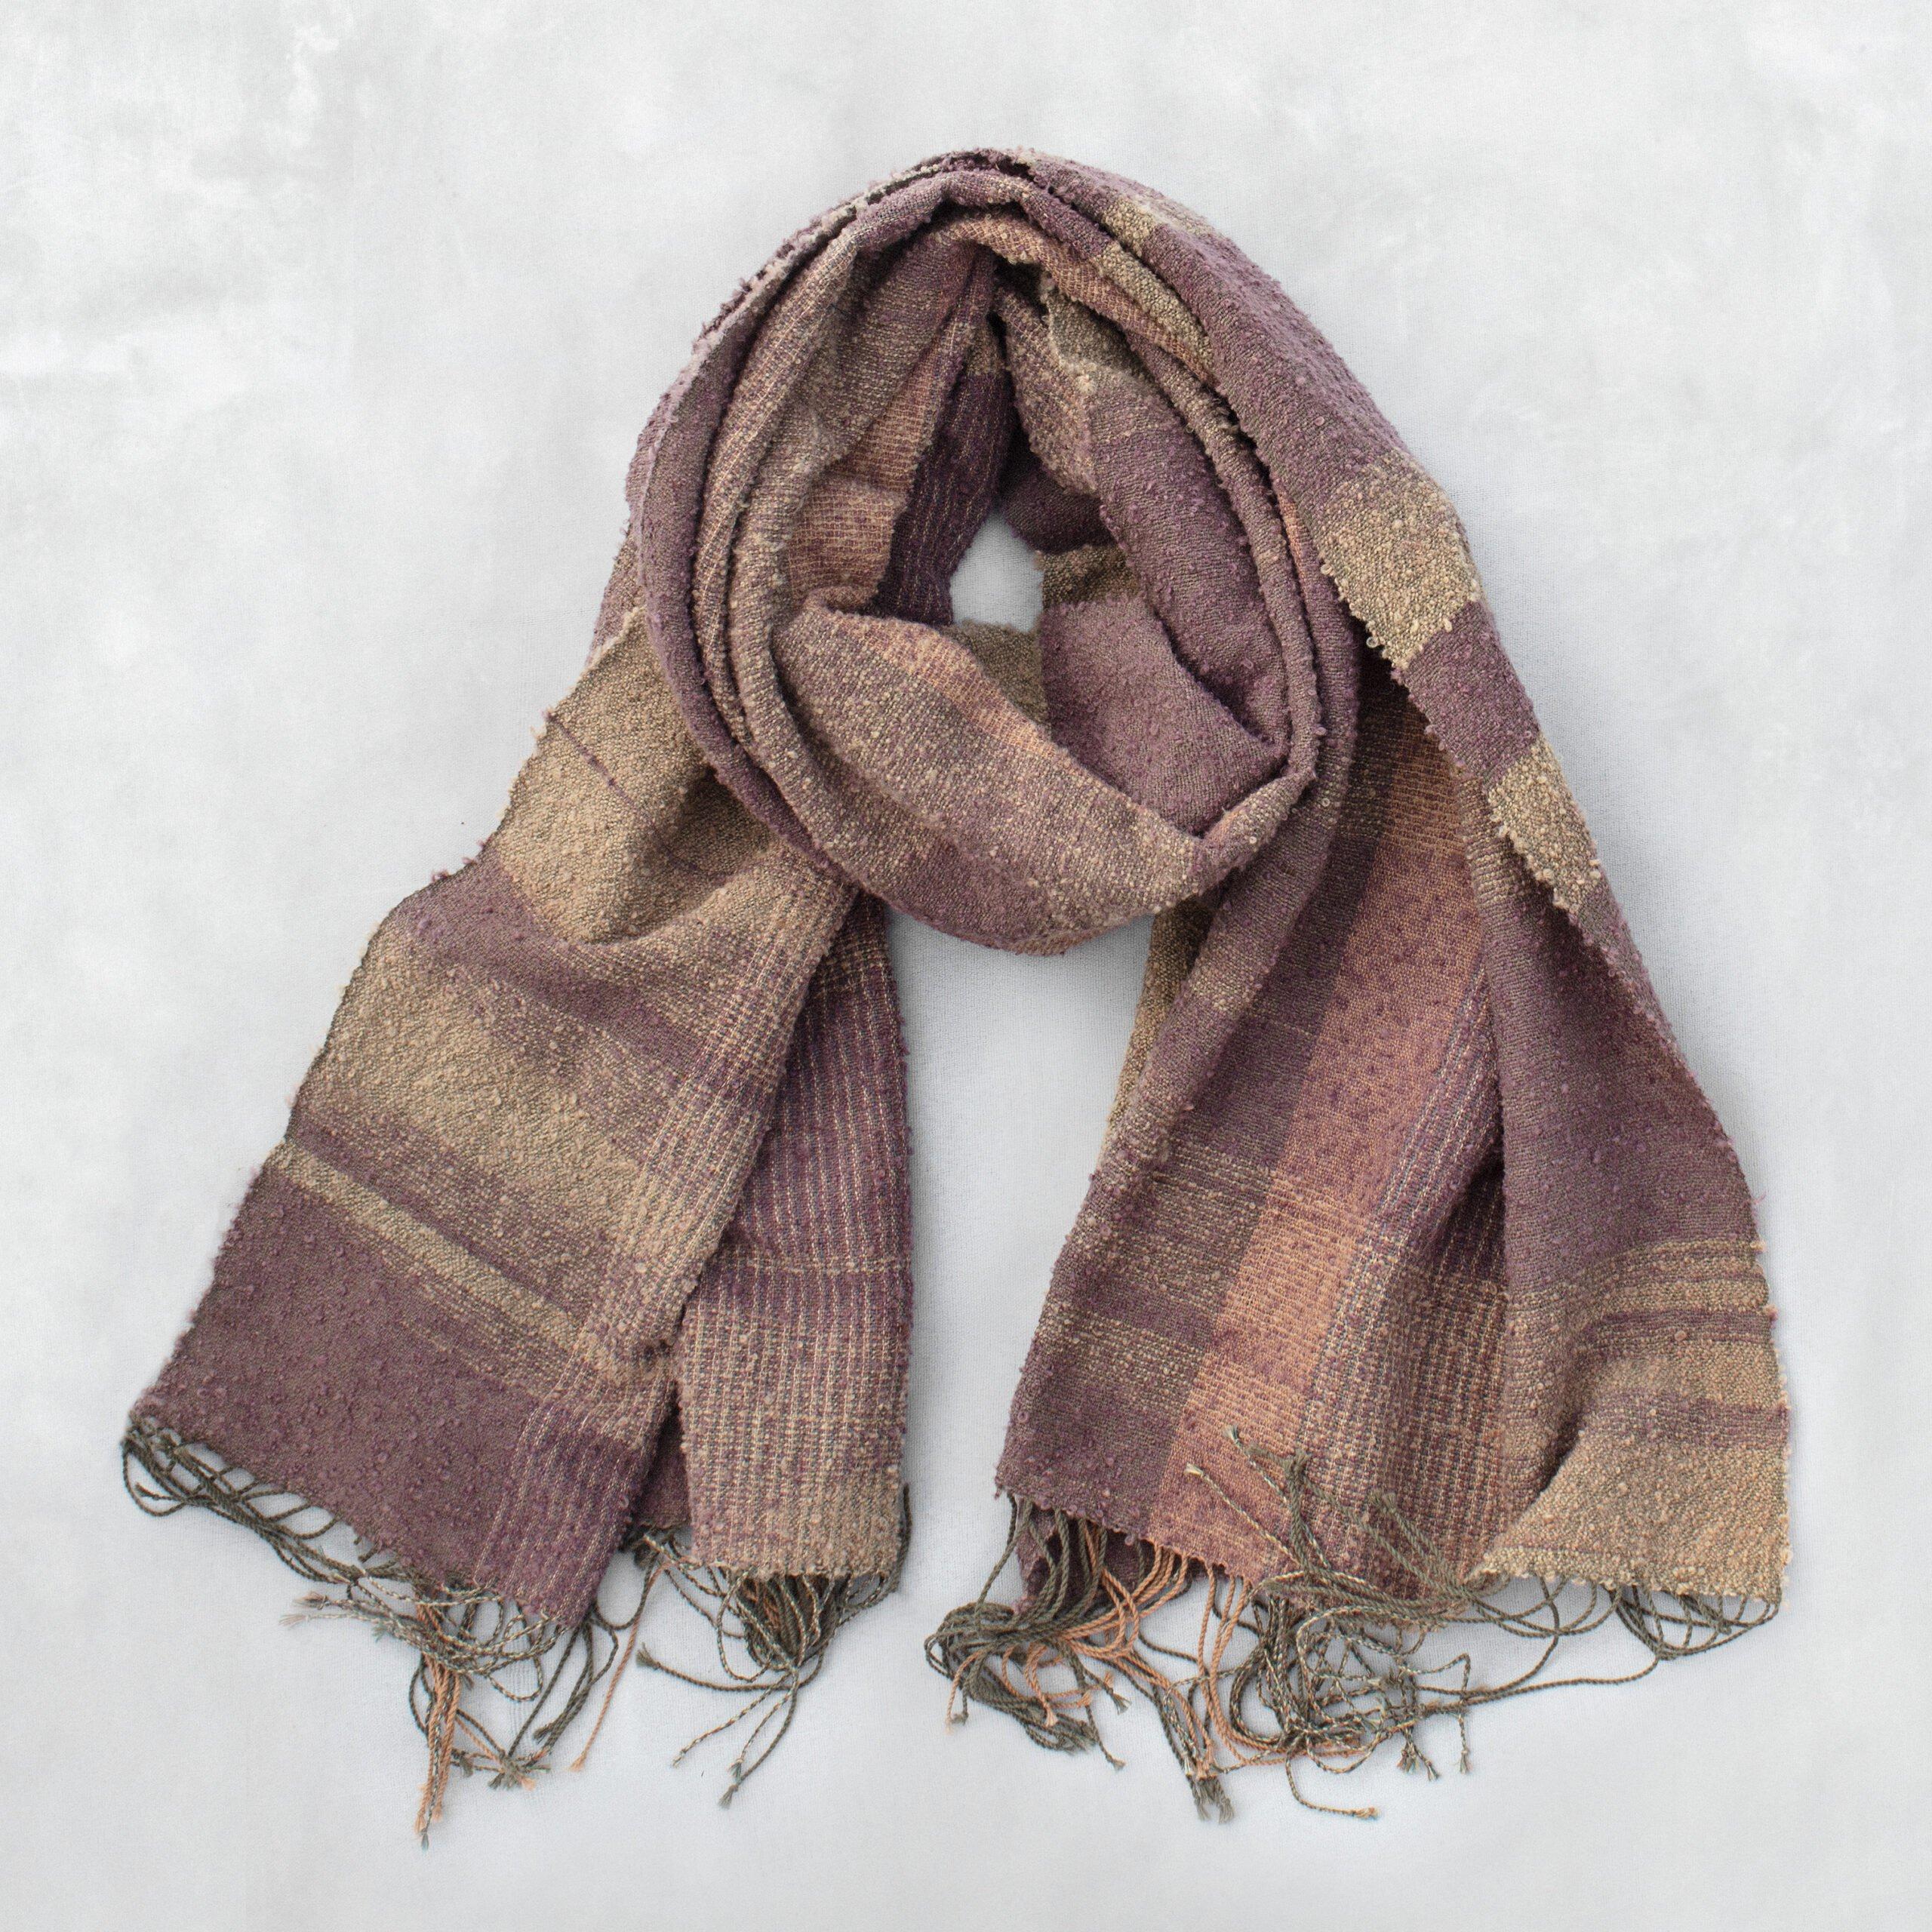 Artisan handwoven scarf handloom